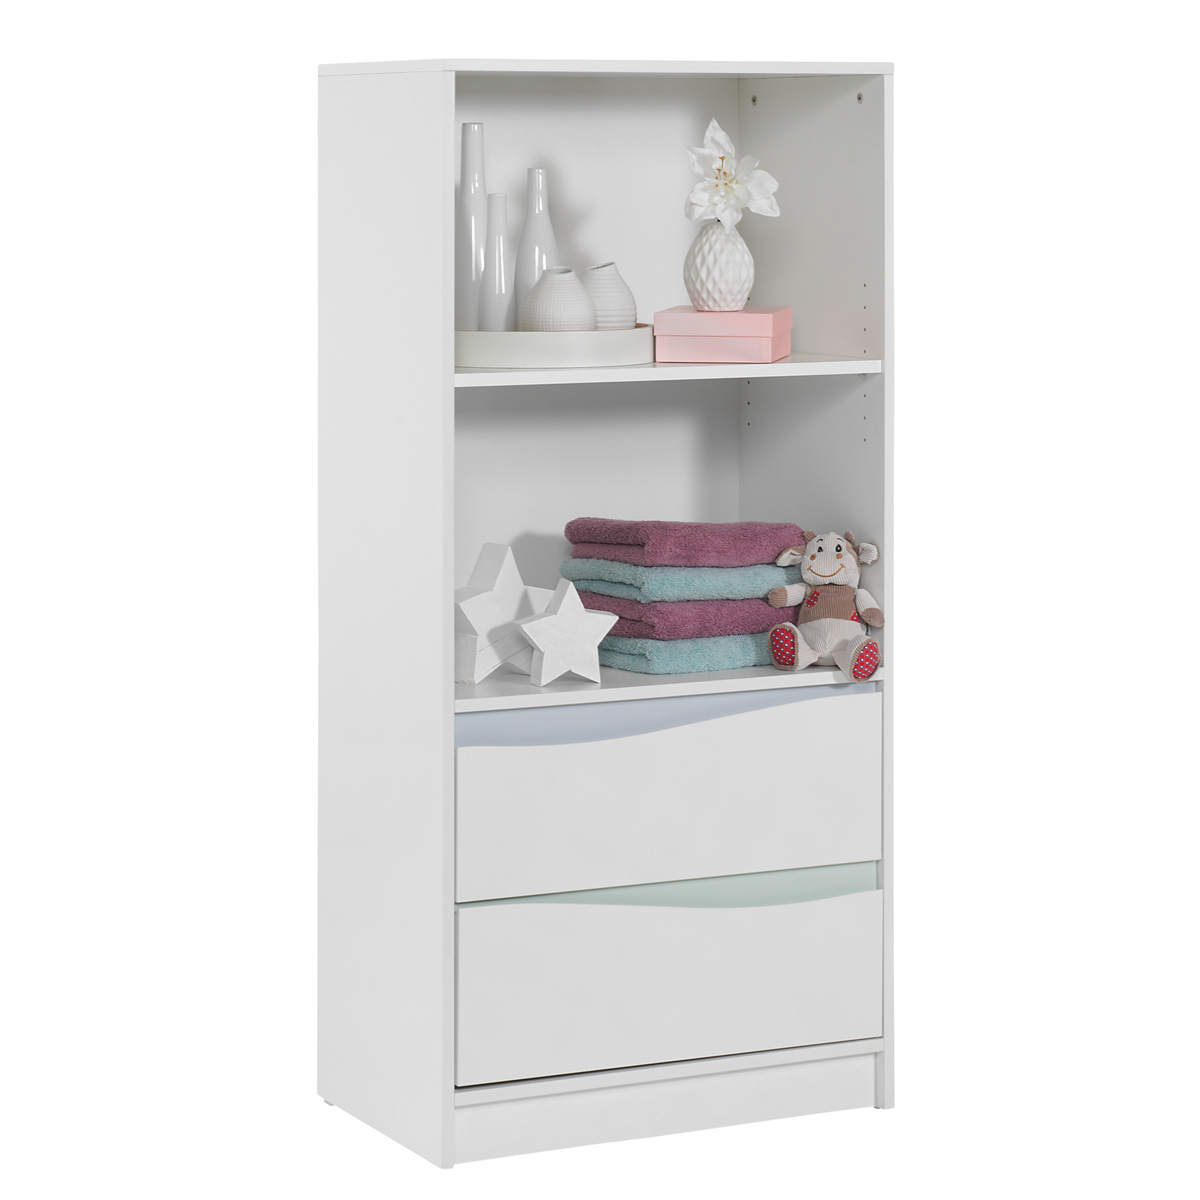 geuther chambre trio lit commode etag re haute collection wave blanc pastel chambre. Black Bedroom Furniture Sets. Home Design Ideas